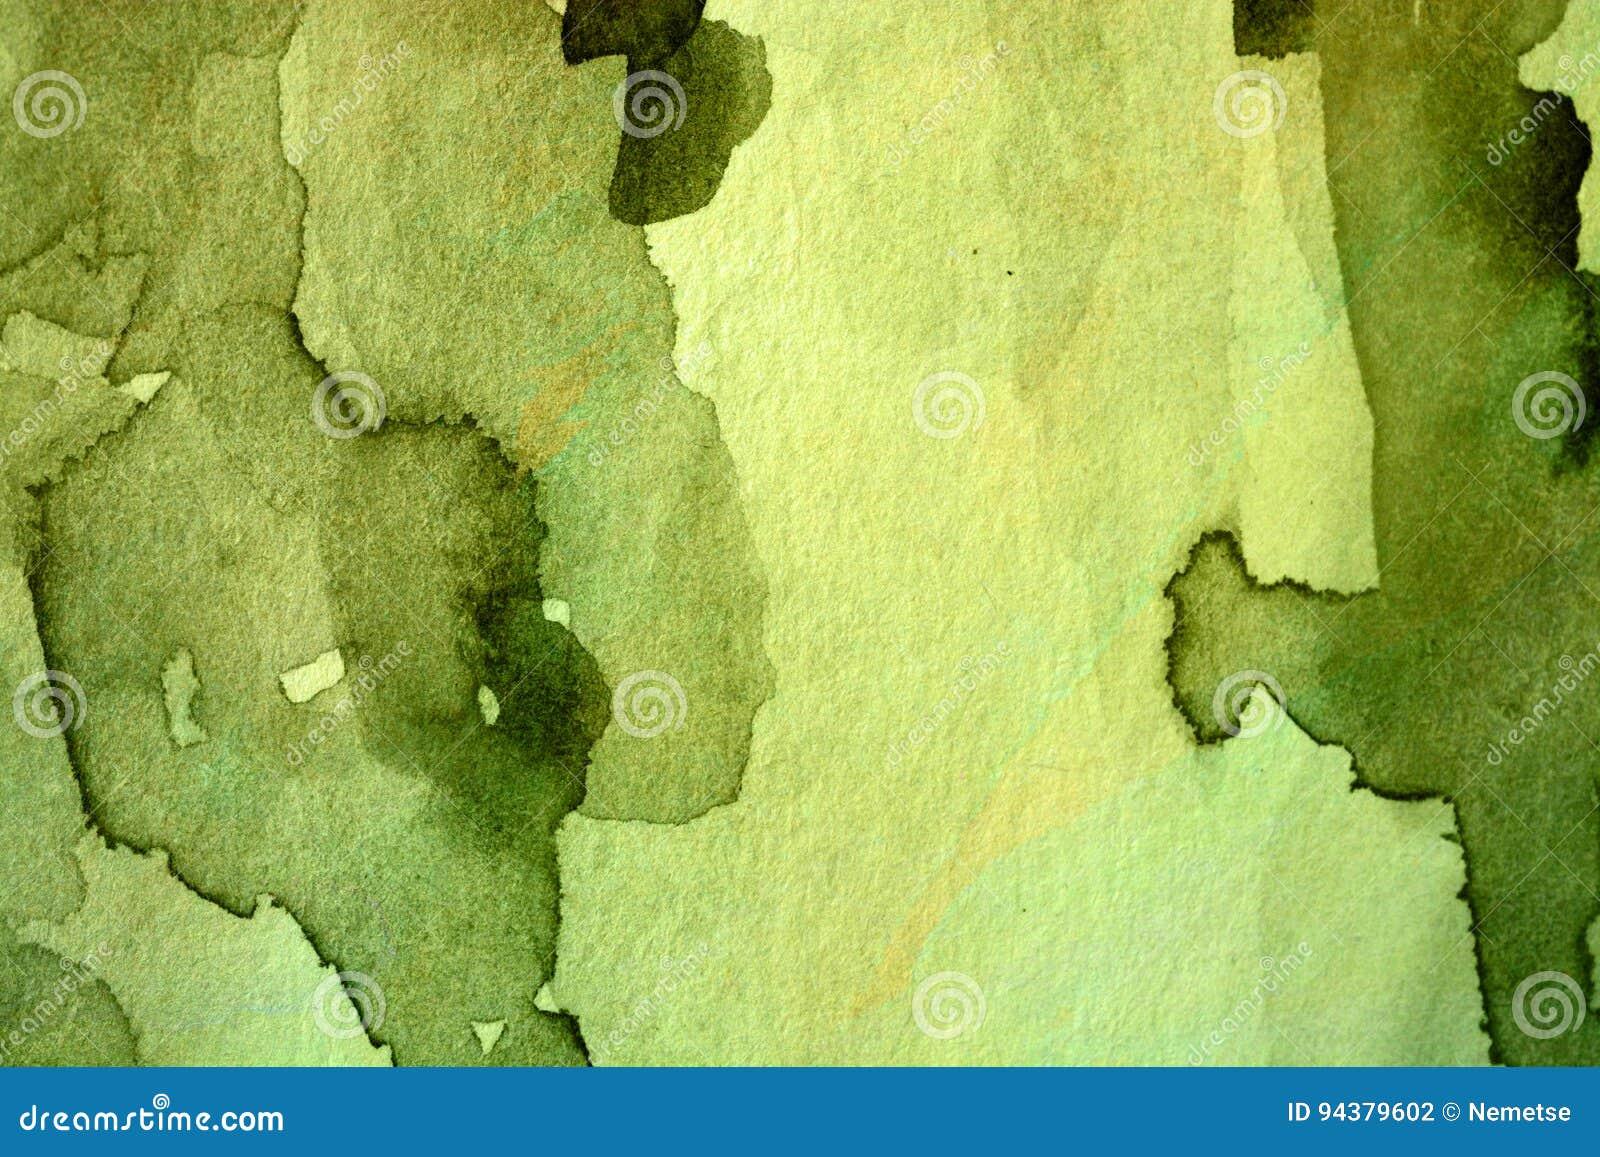 Dark Green Grunge Background Stock Photo - Image of decor, material ...